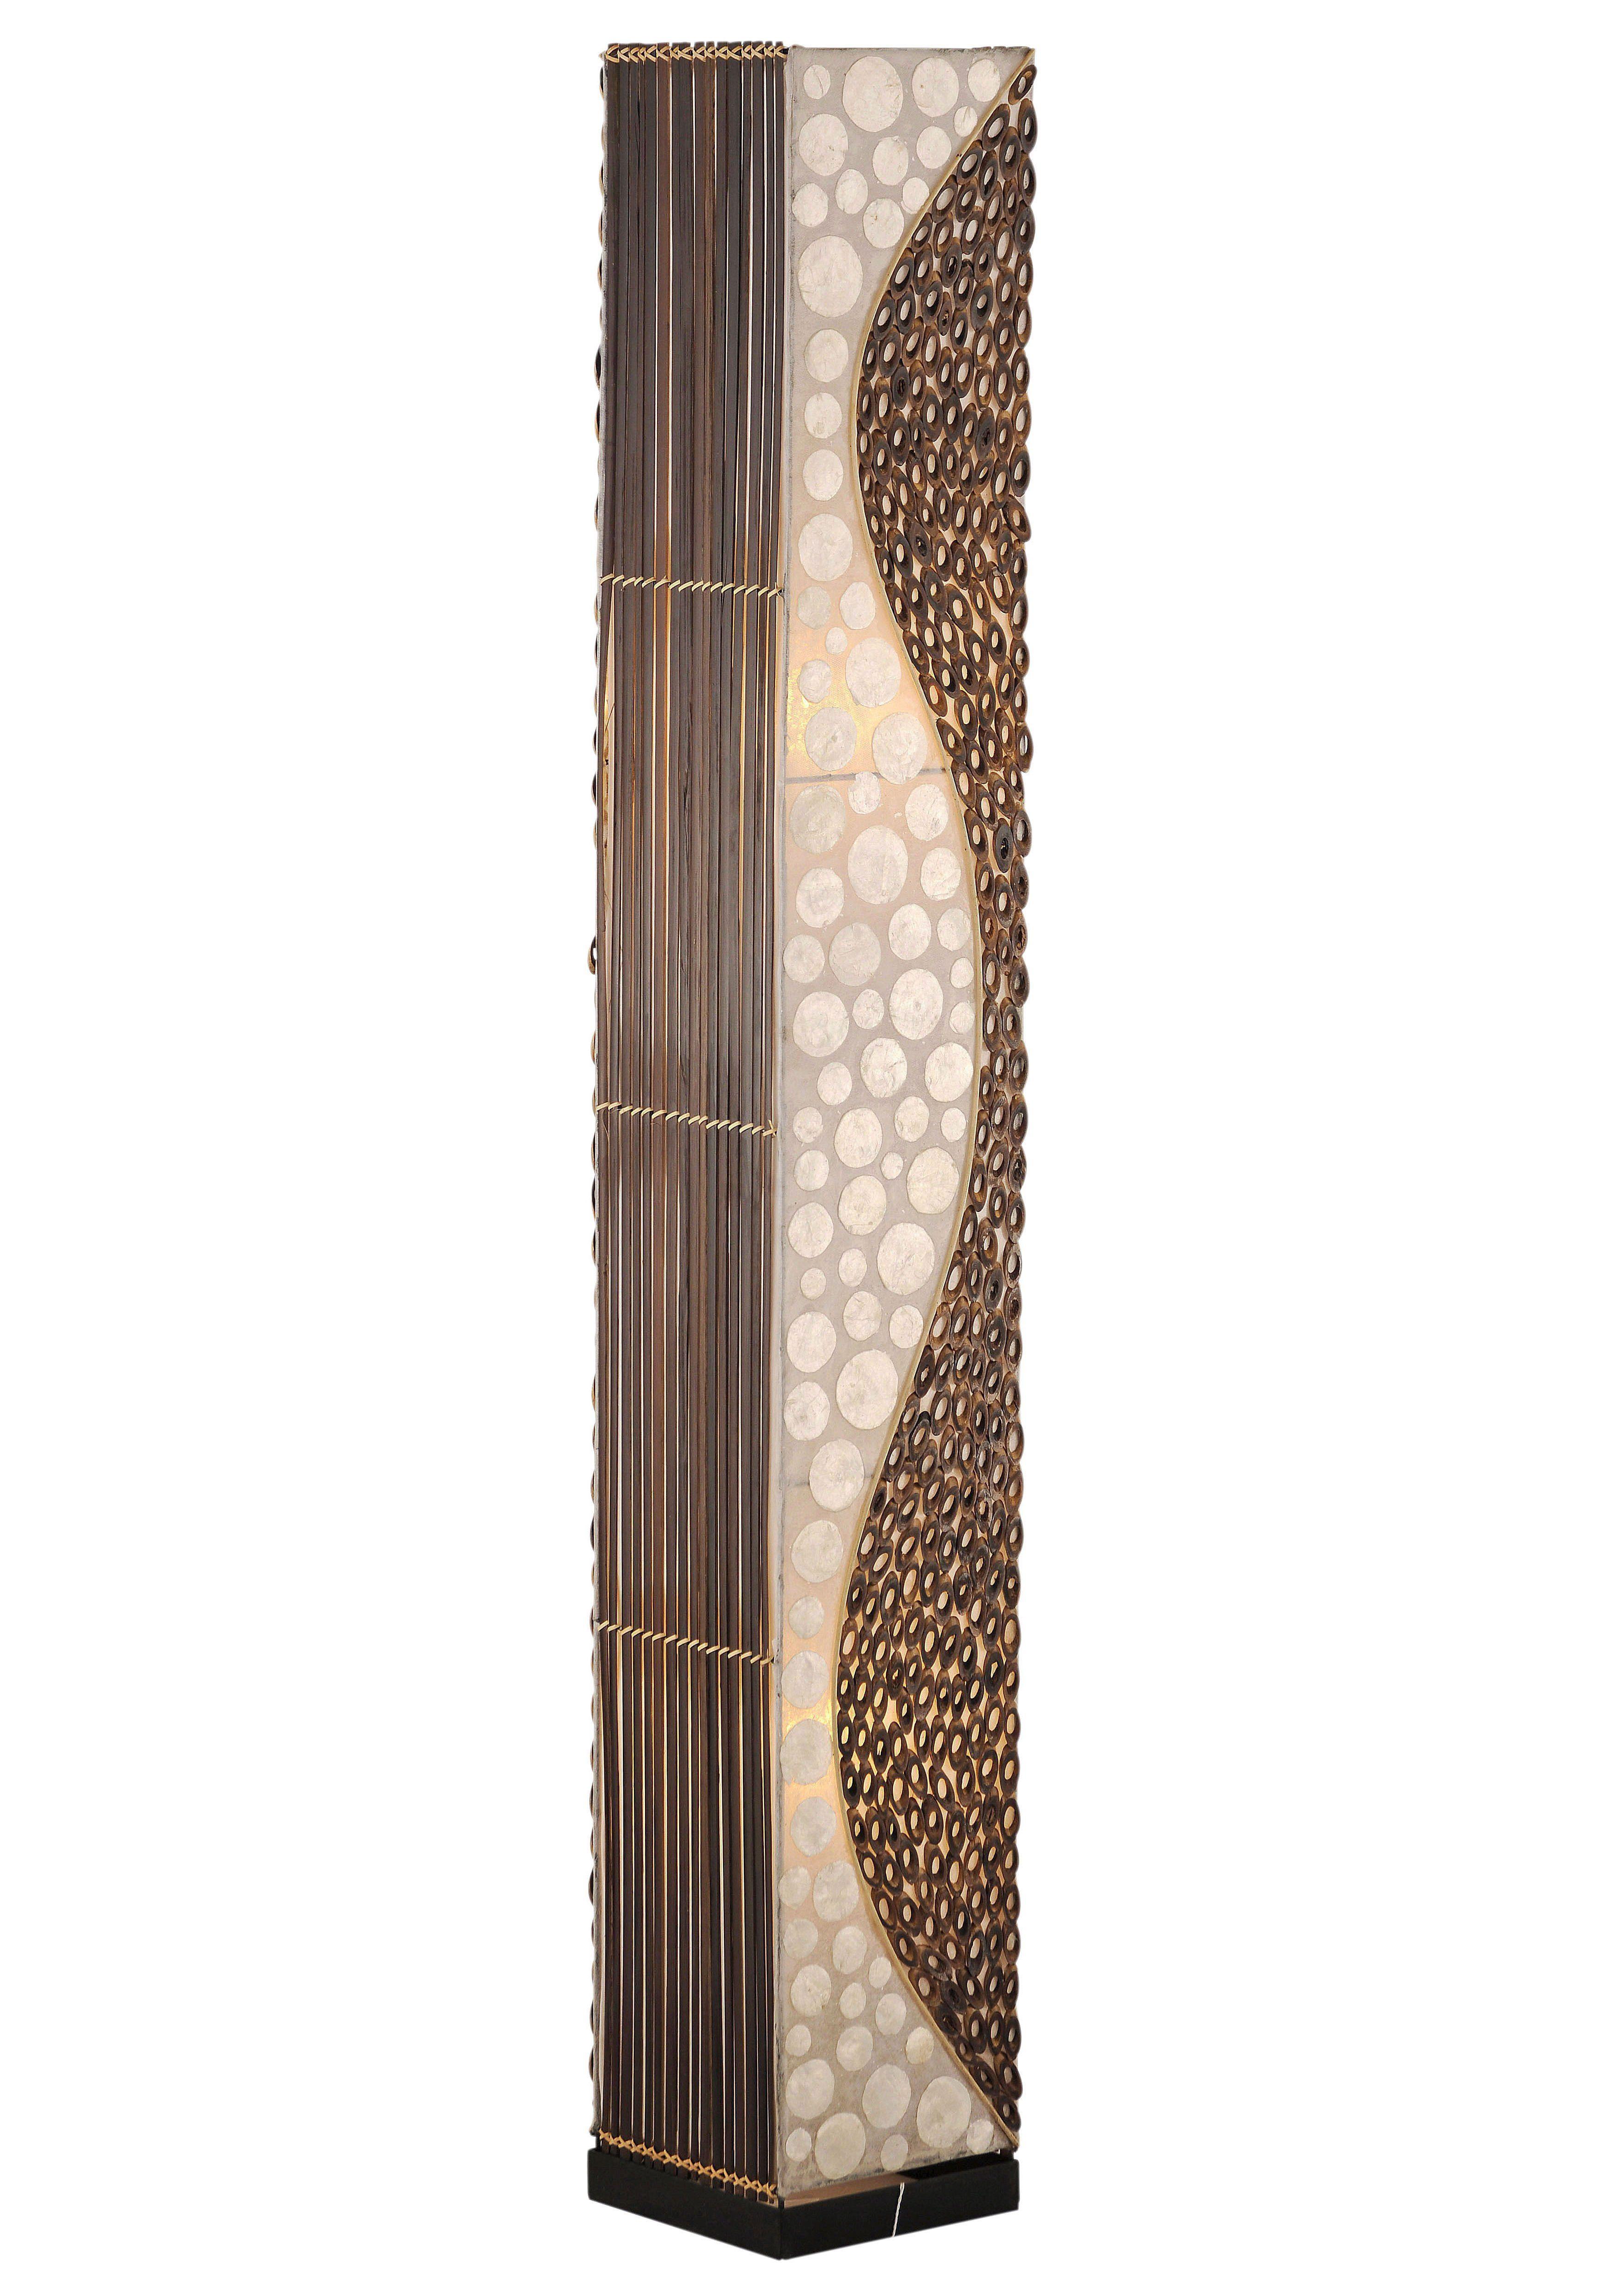 Stehlampe (2-flg.), Paul Neuhaus